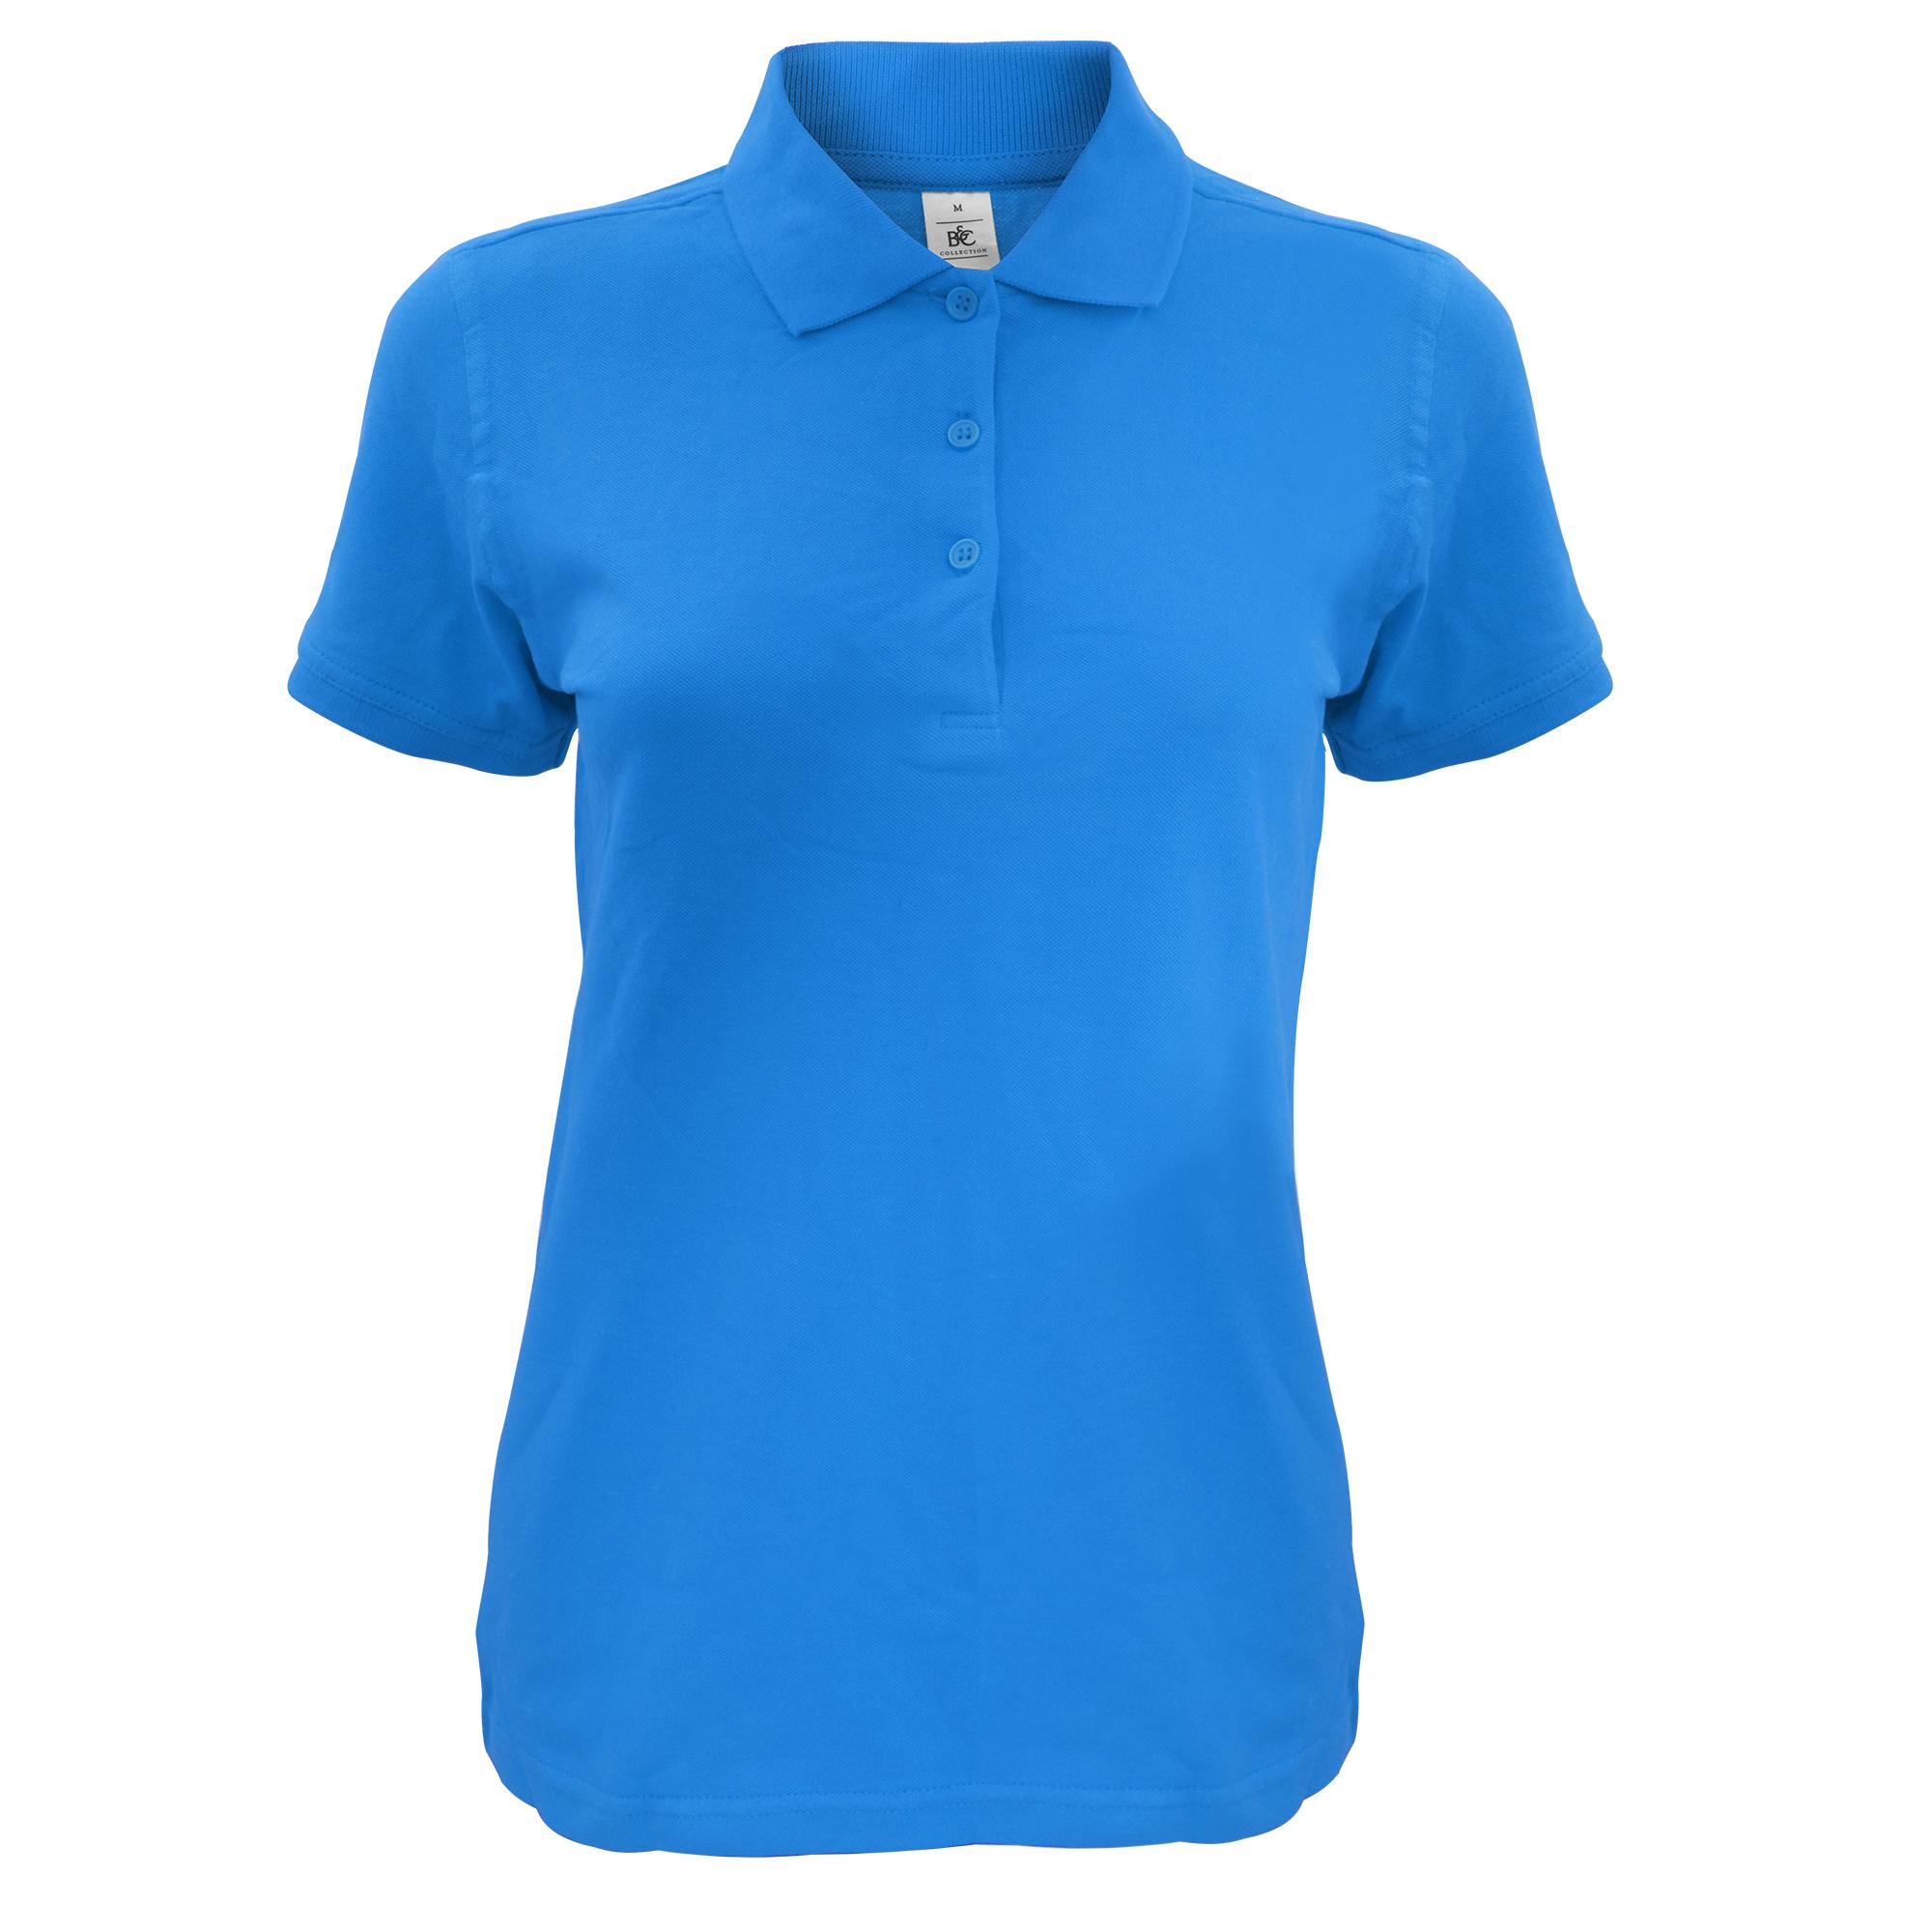 B C Womens Ladies Safran Timeless Polo Shirt Ebay